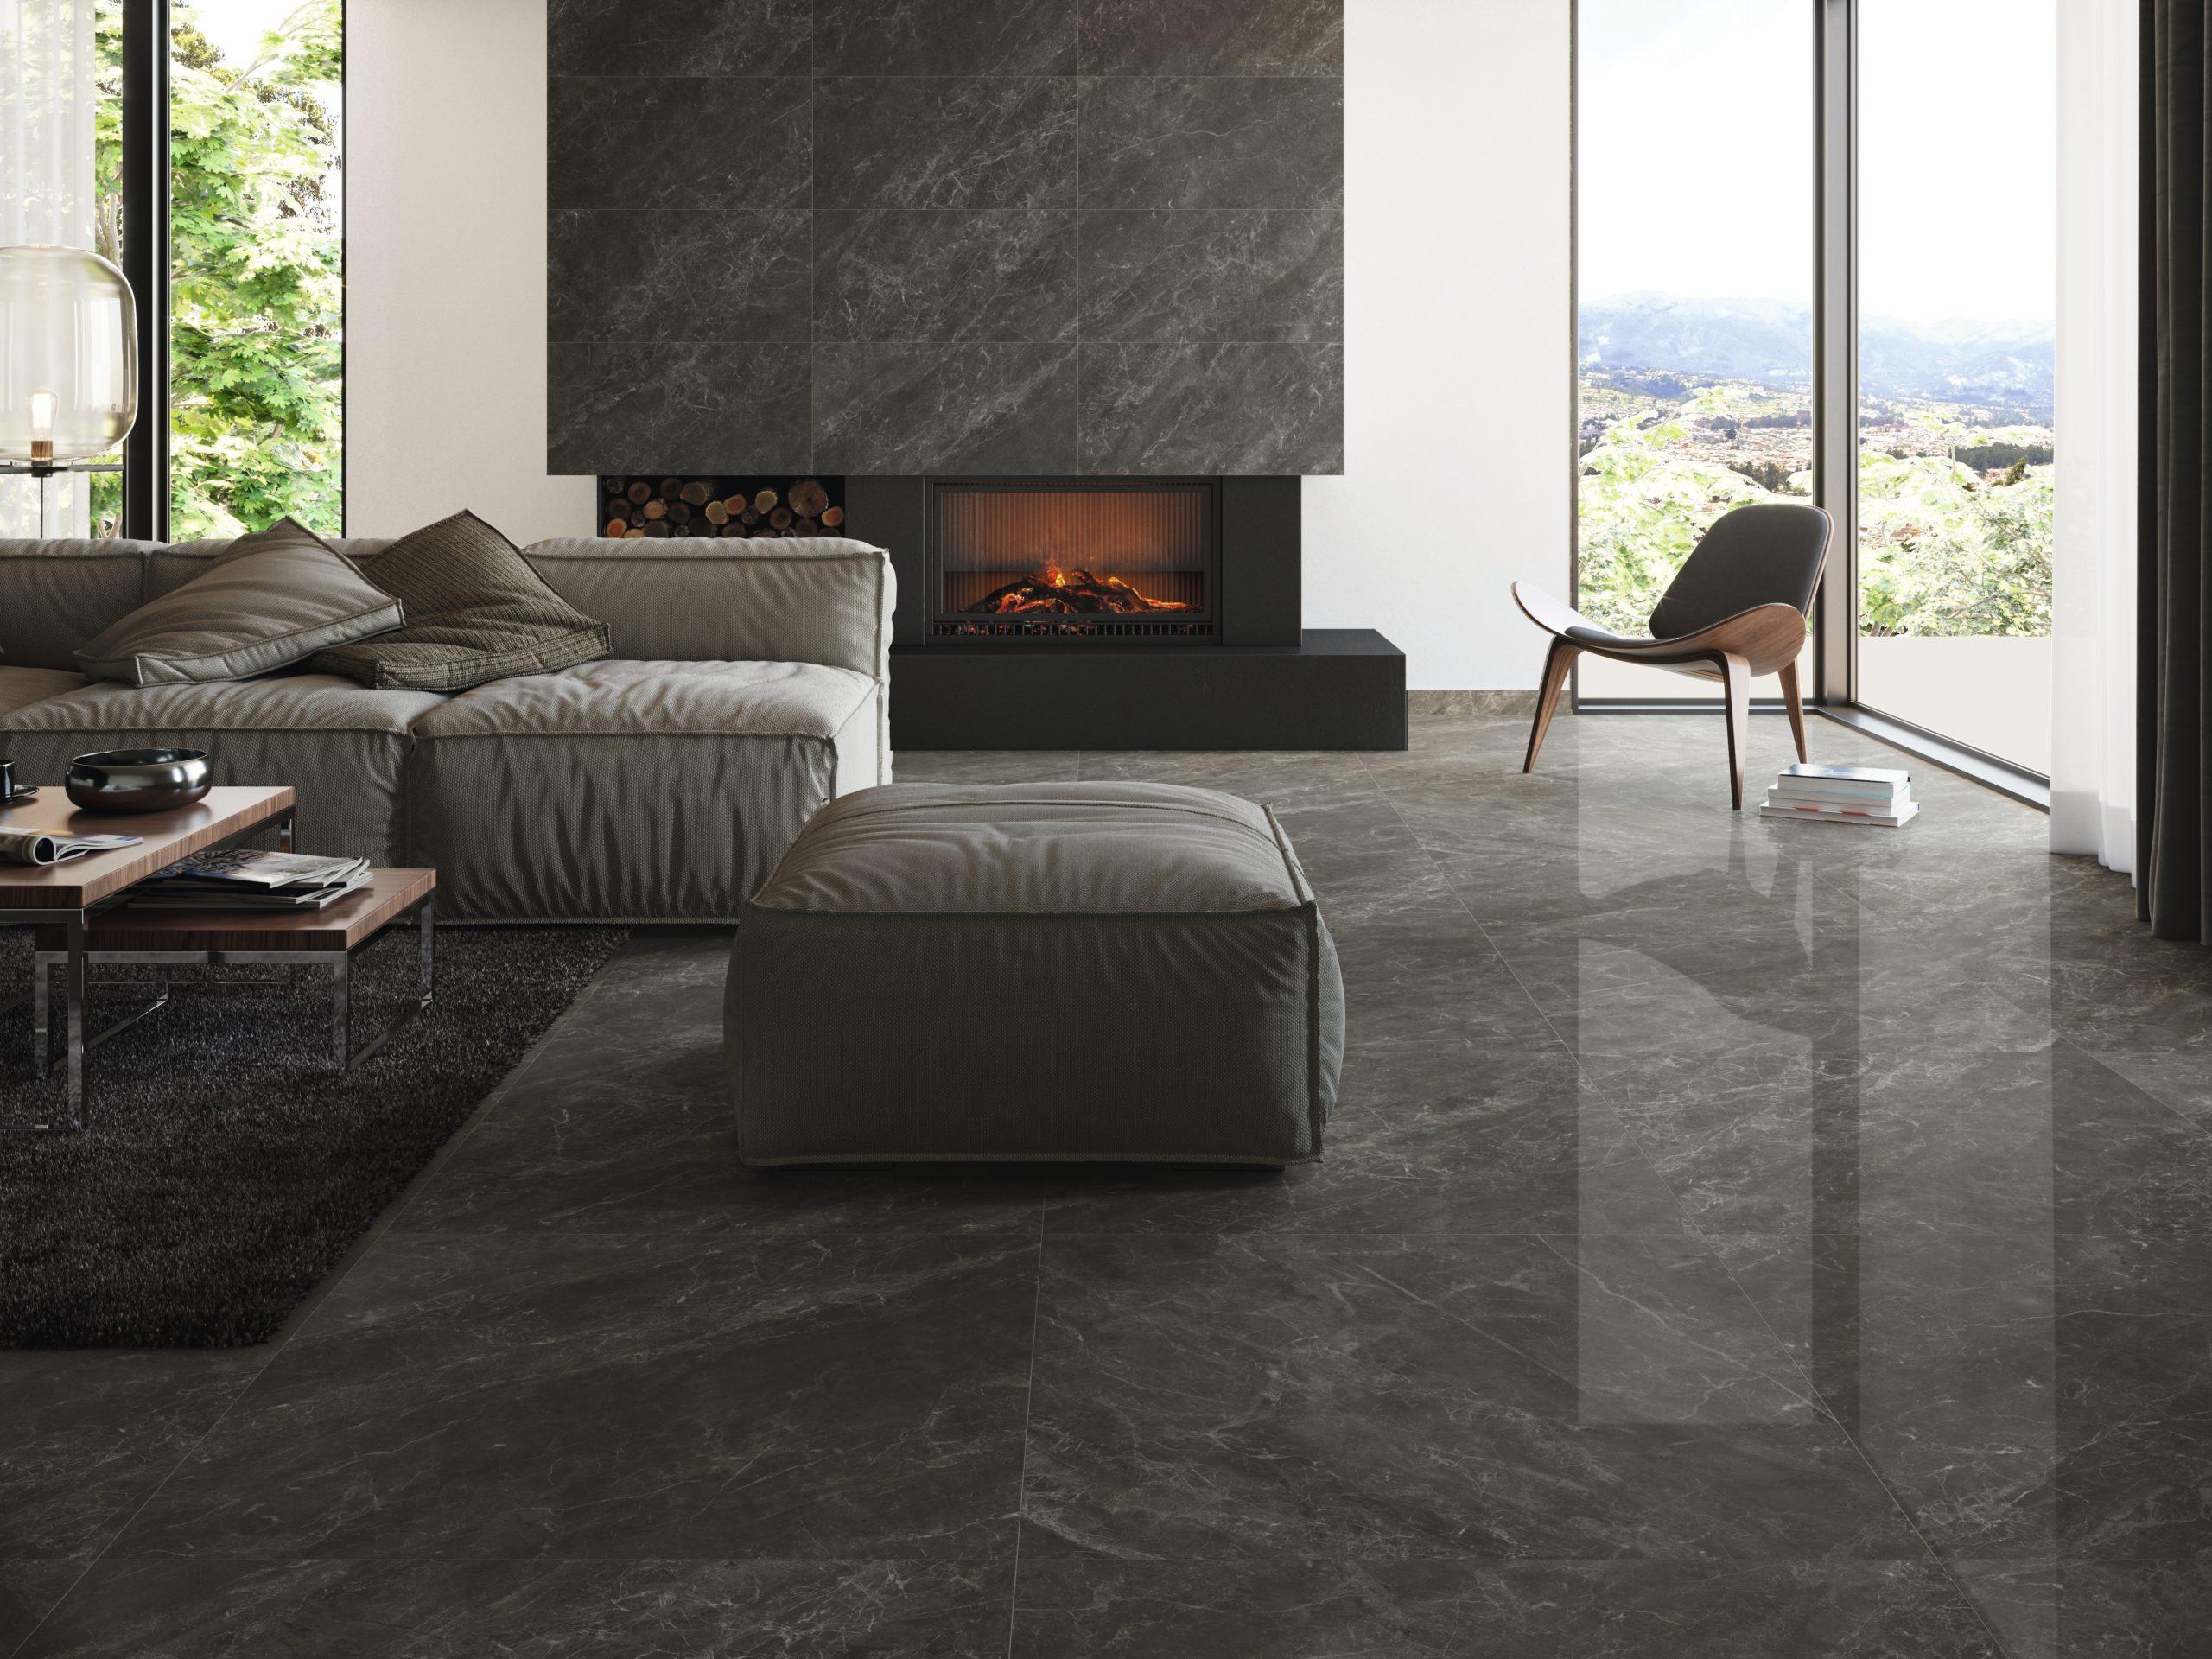 Carrelage Imitation Bois Brillant balmoral imitation marbre brillant 60x60 26€/m2